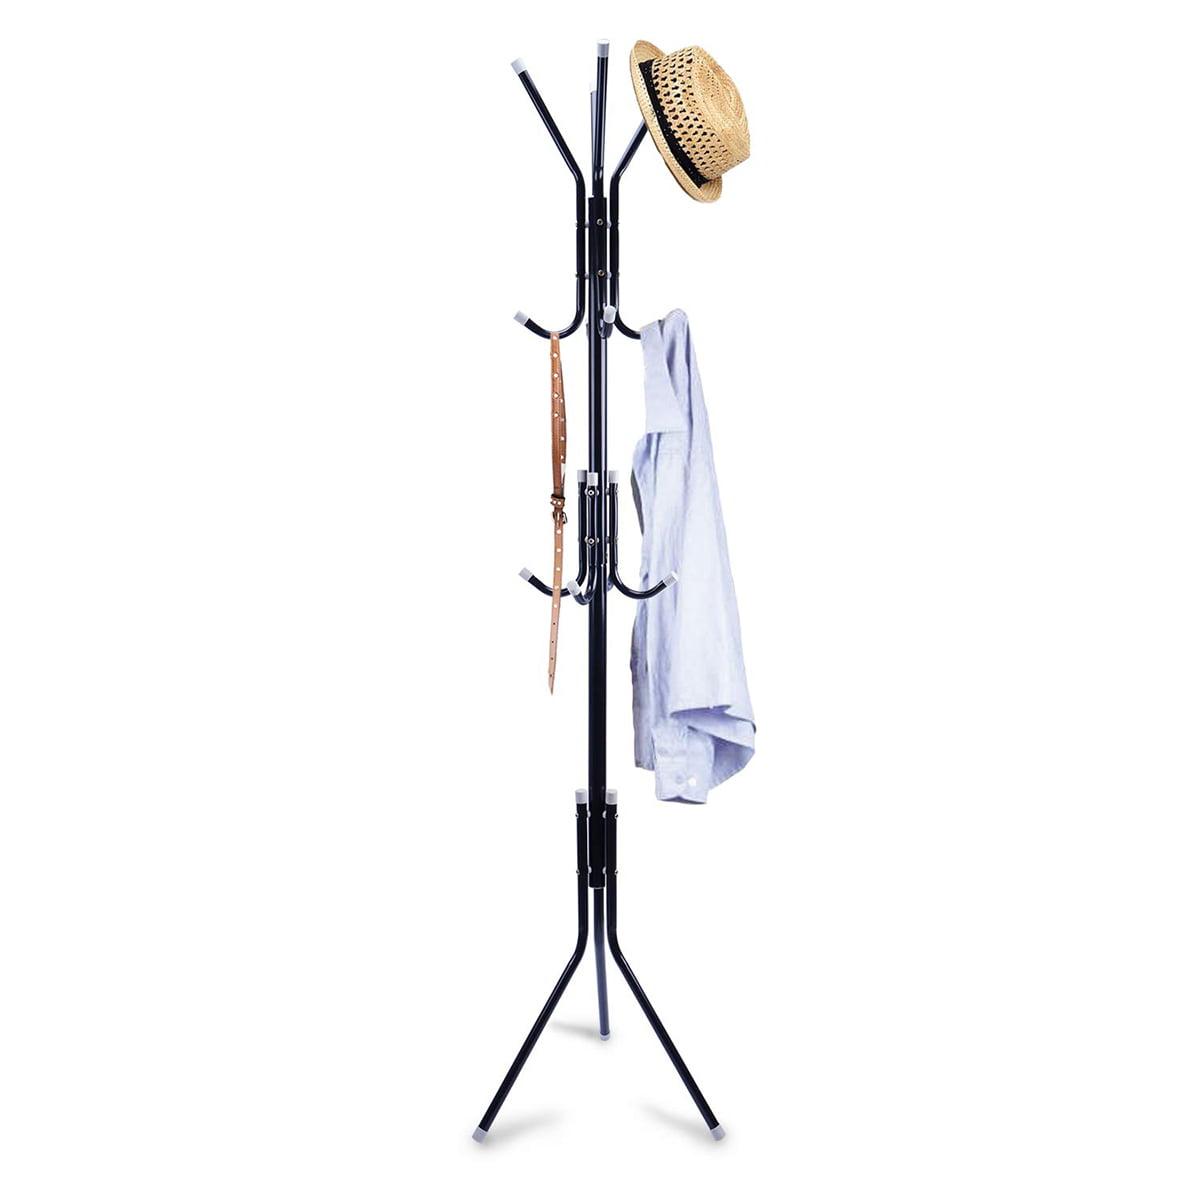 8 Hooks Metal Stand Coat Rack Tree Hat Jacket Umbrella Hanger Holder Stora